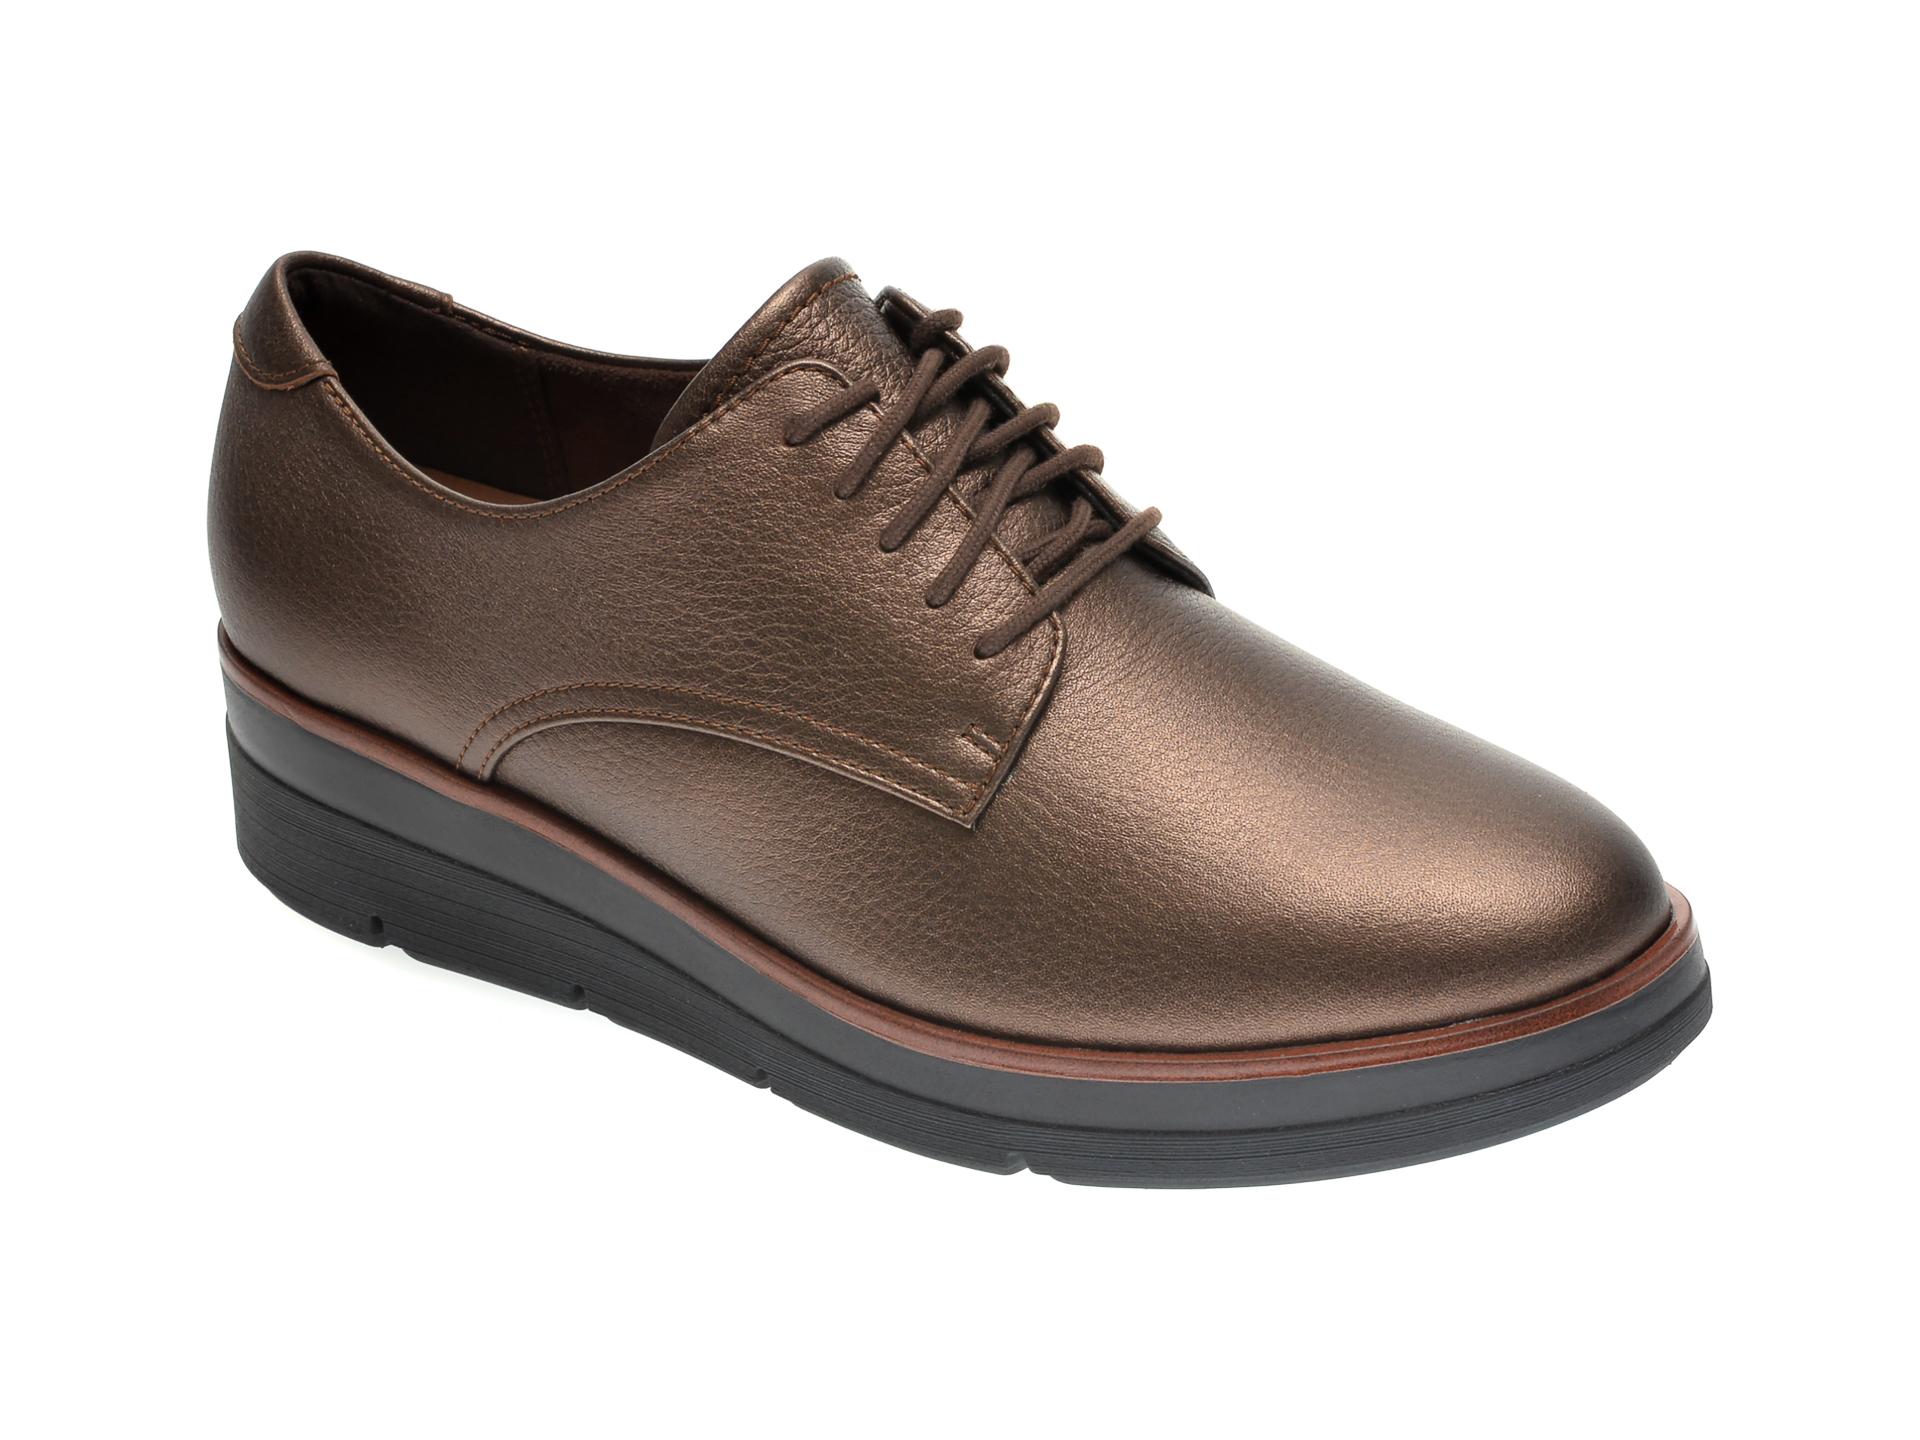 Pantofi CLARKS maro, SHAYLIN LACE, din piele naturala